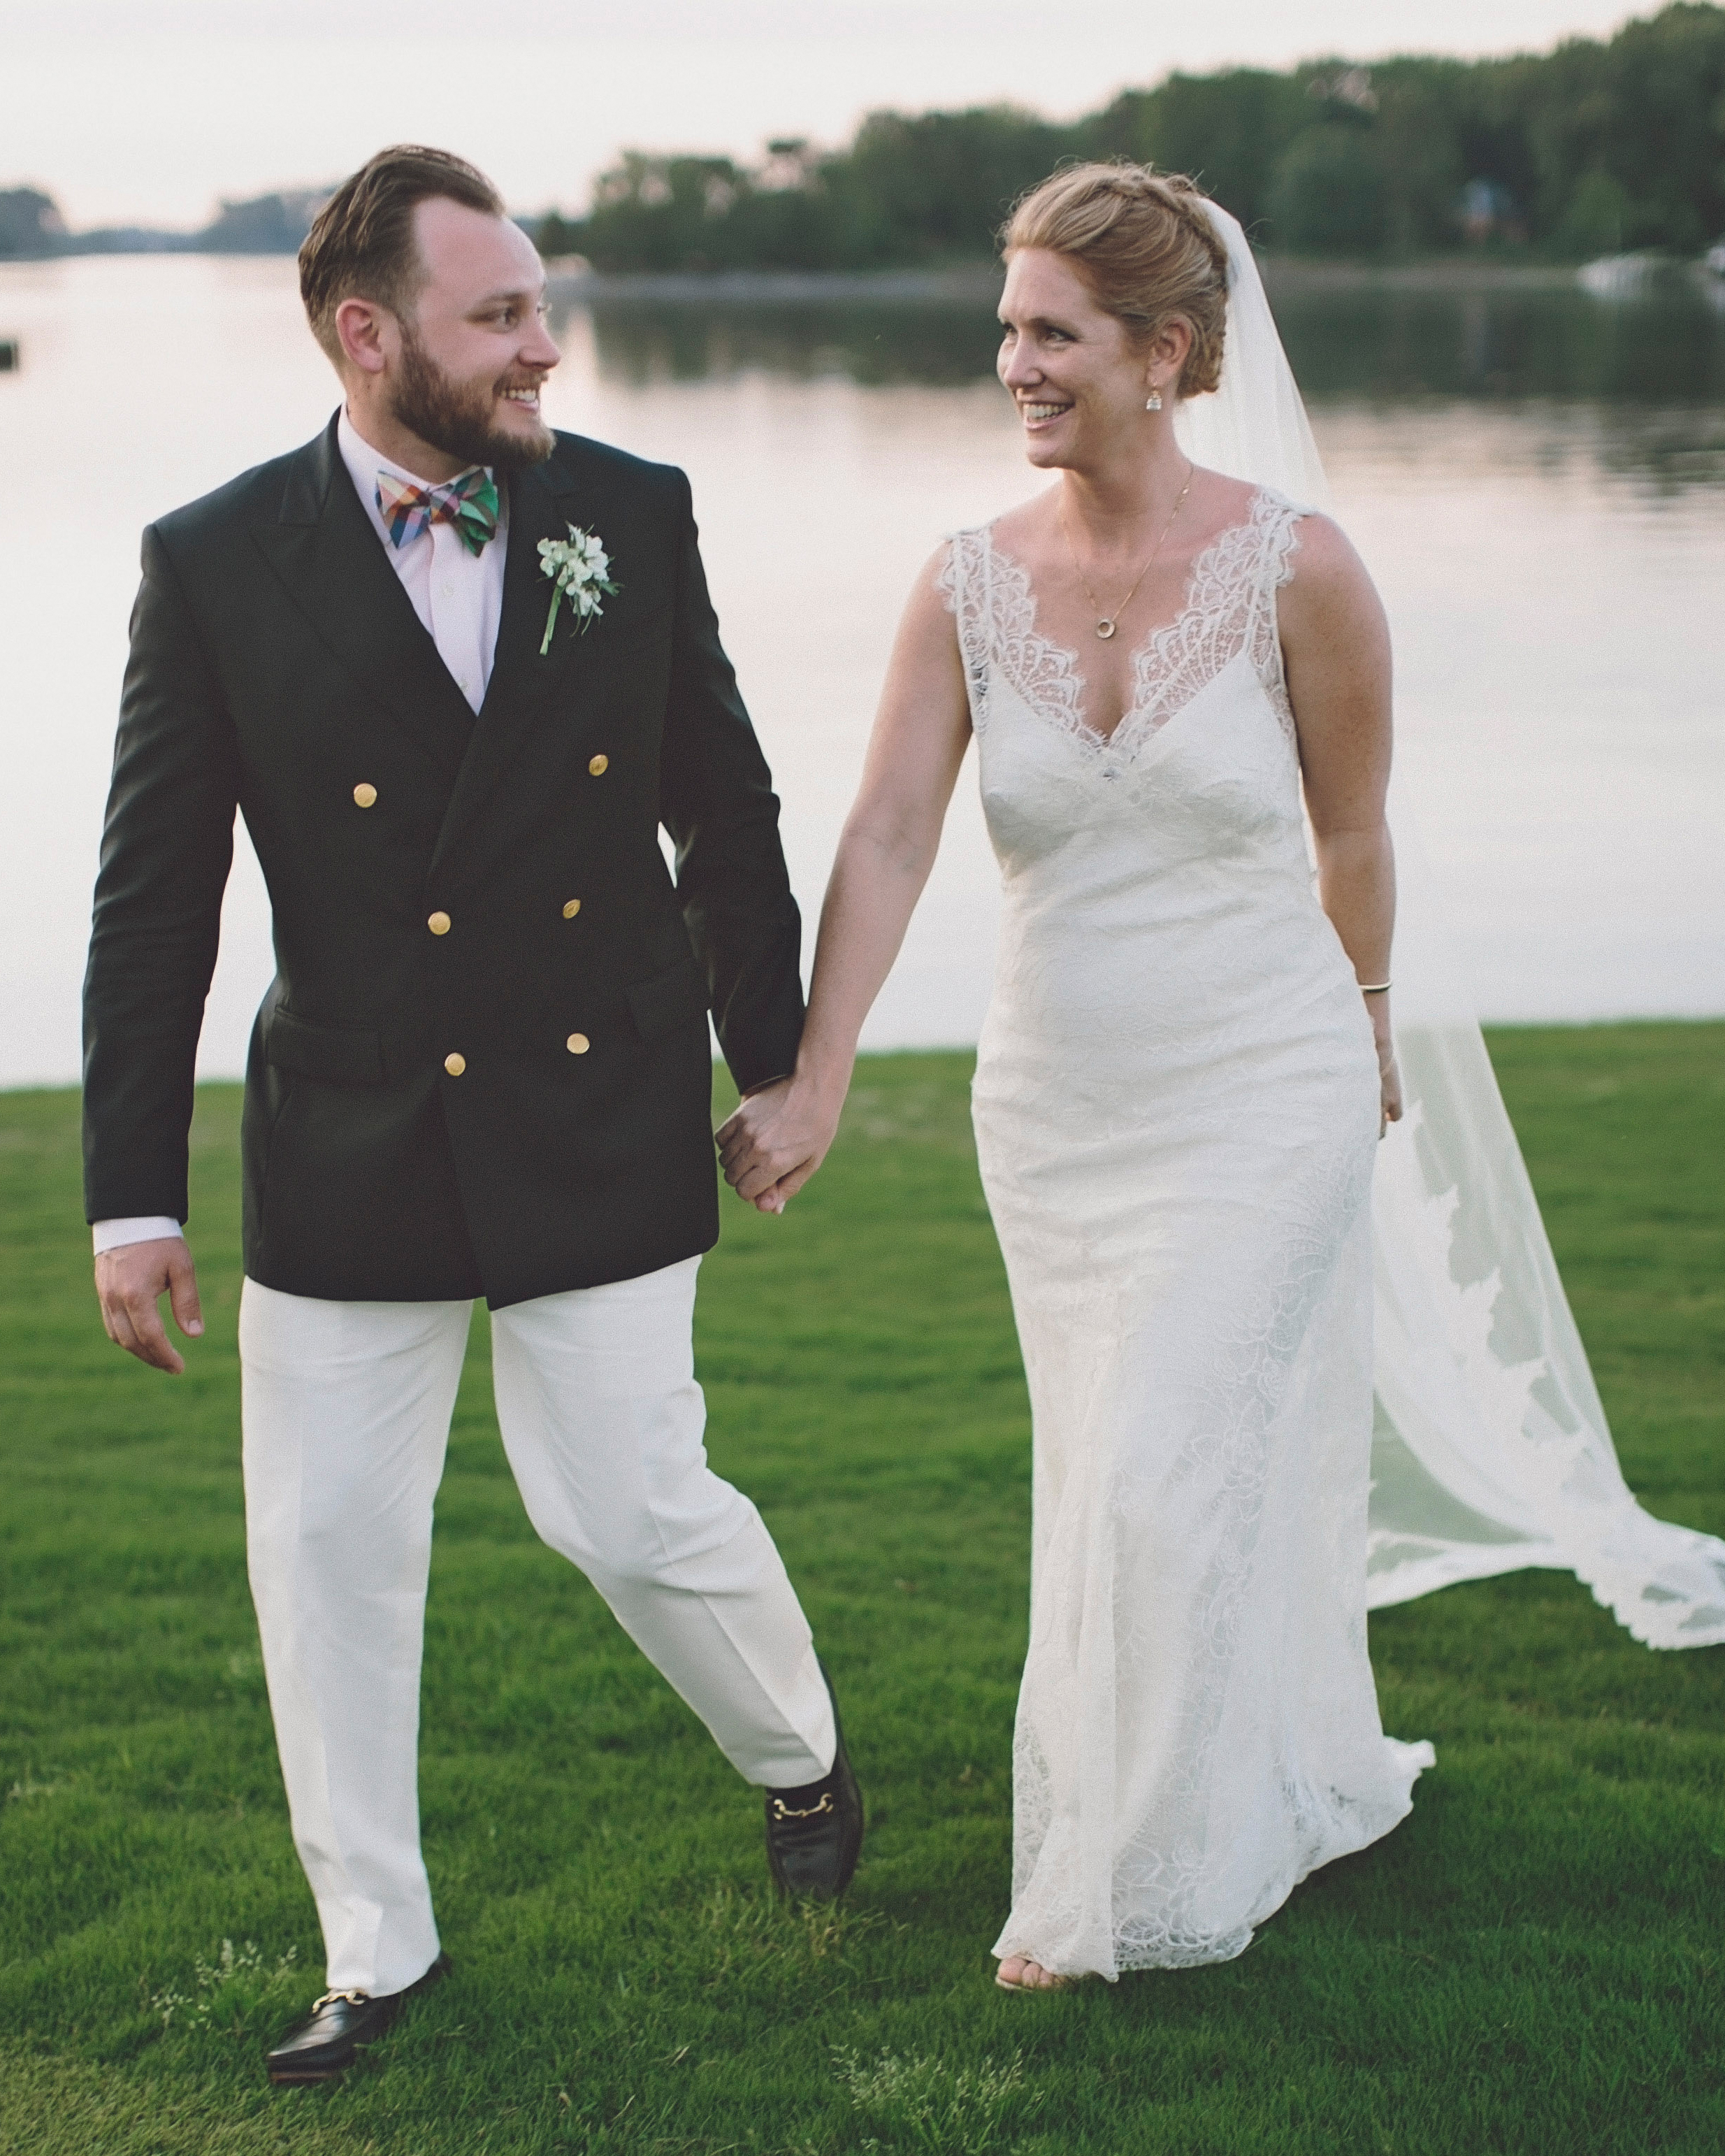 molly-greg-wedding-couple-00082-s111481-0814.jpg